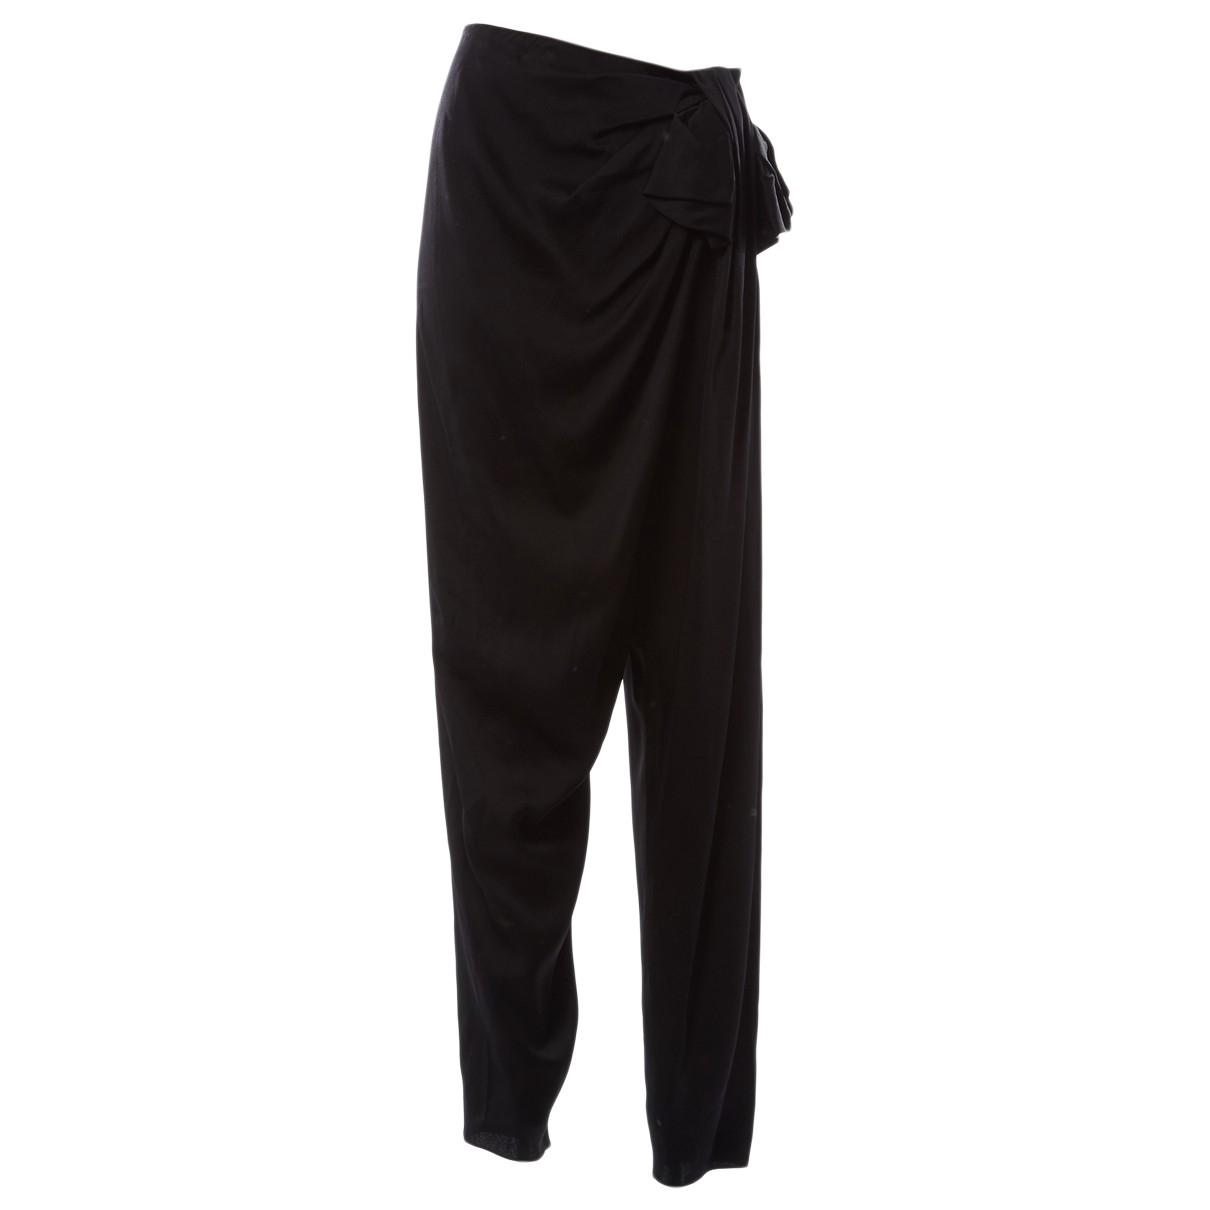 Lanvin \N Black Trousers for Women 40 FR